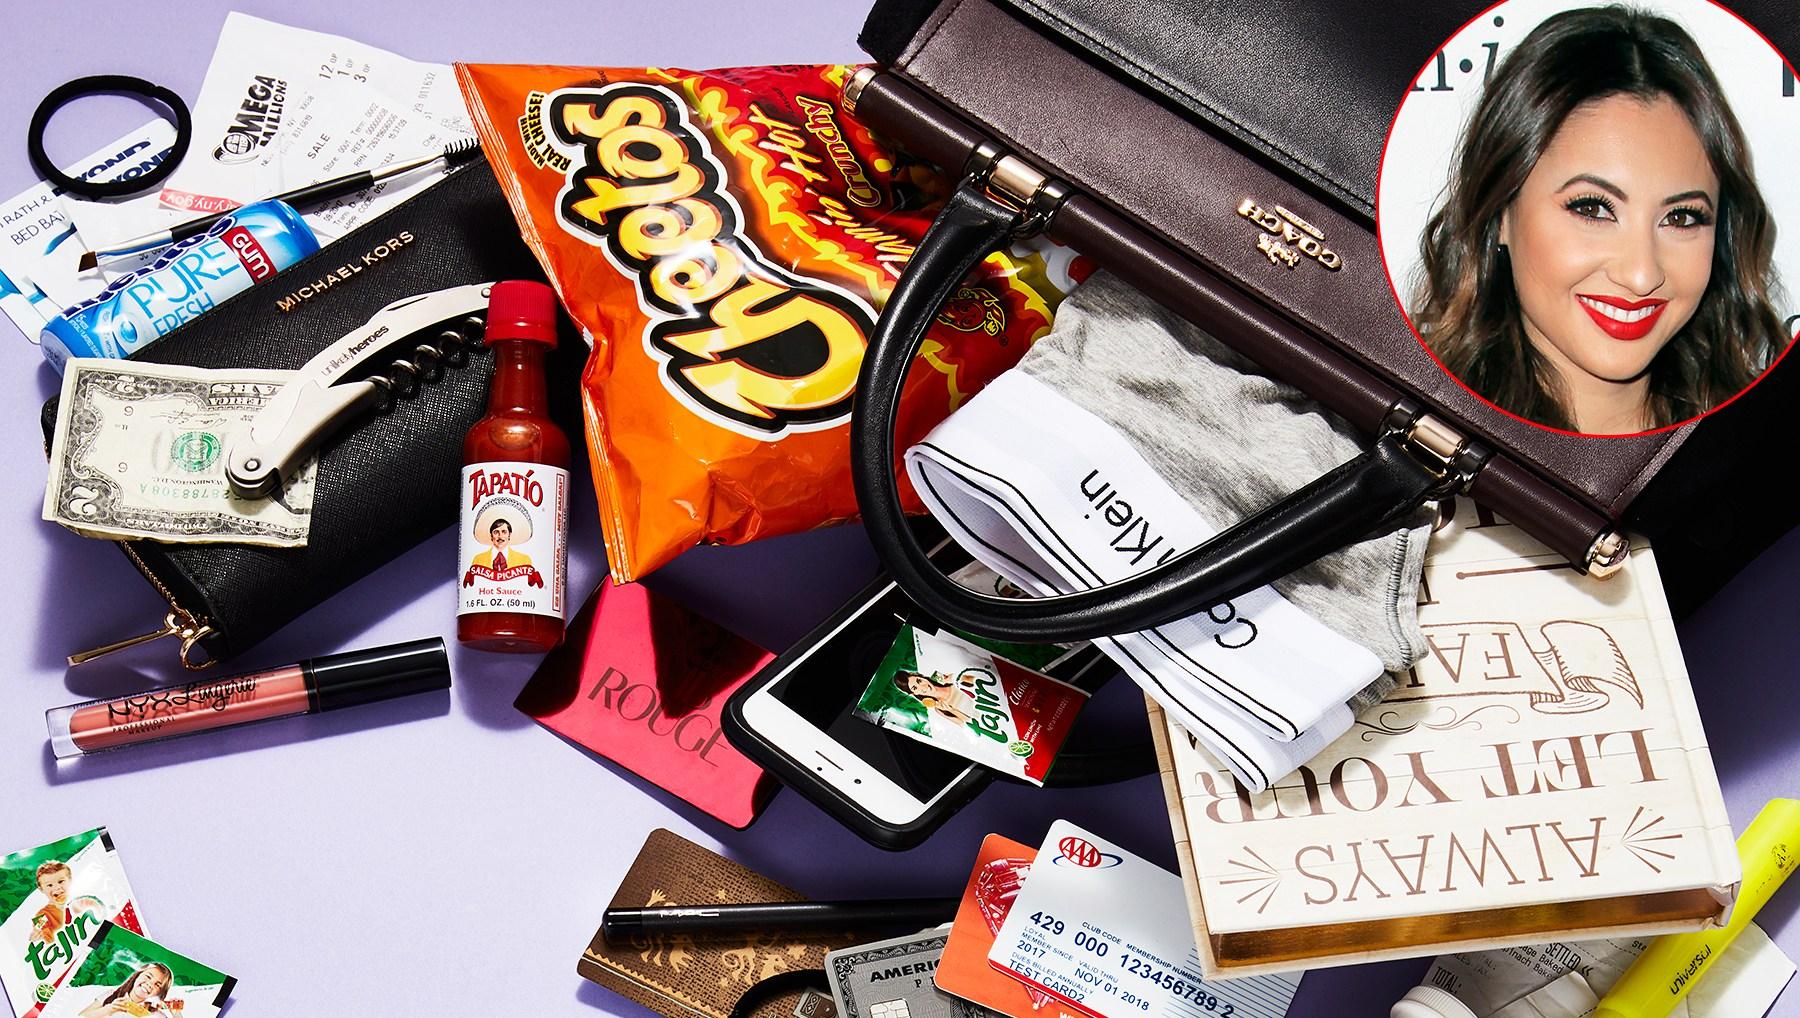 Francia Raisa What's In My Bag